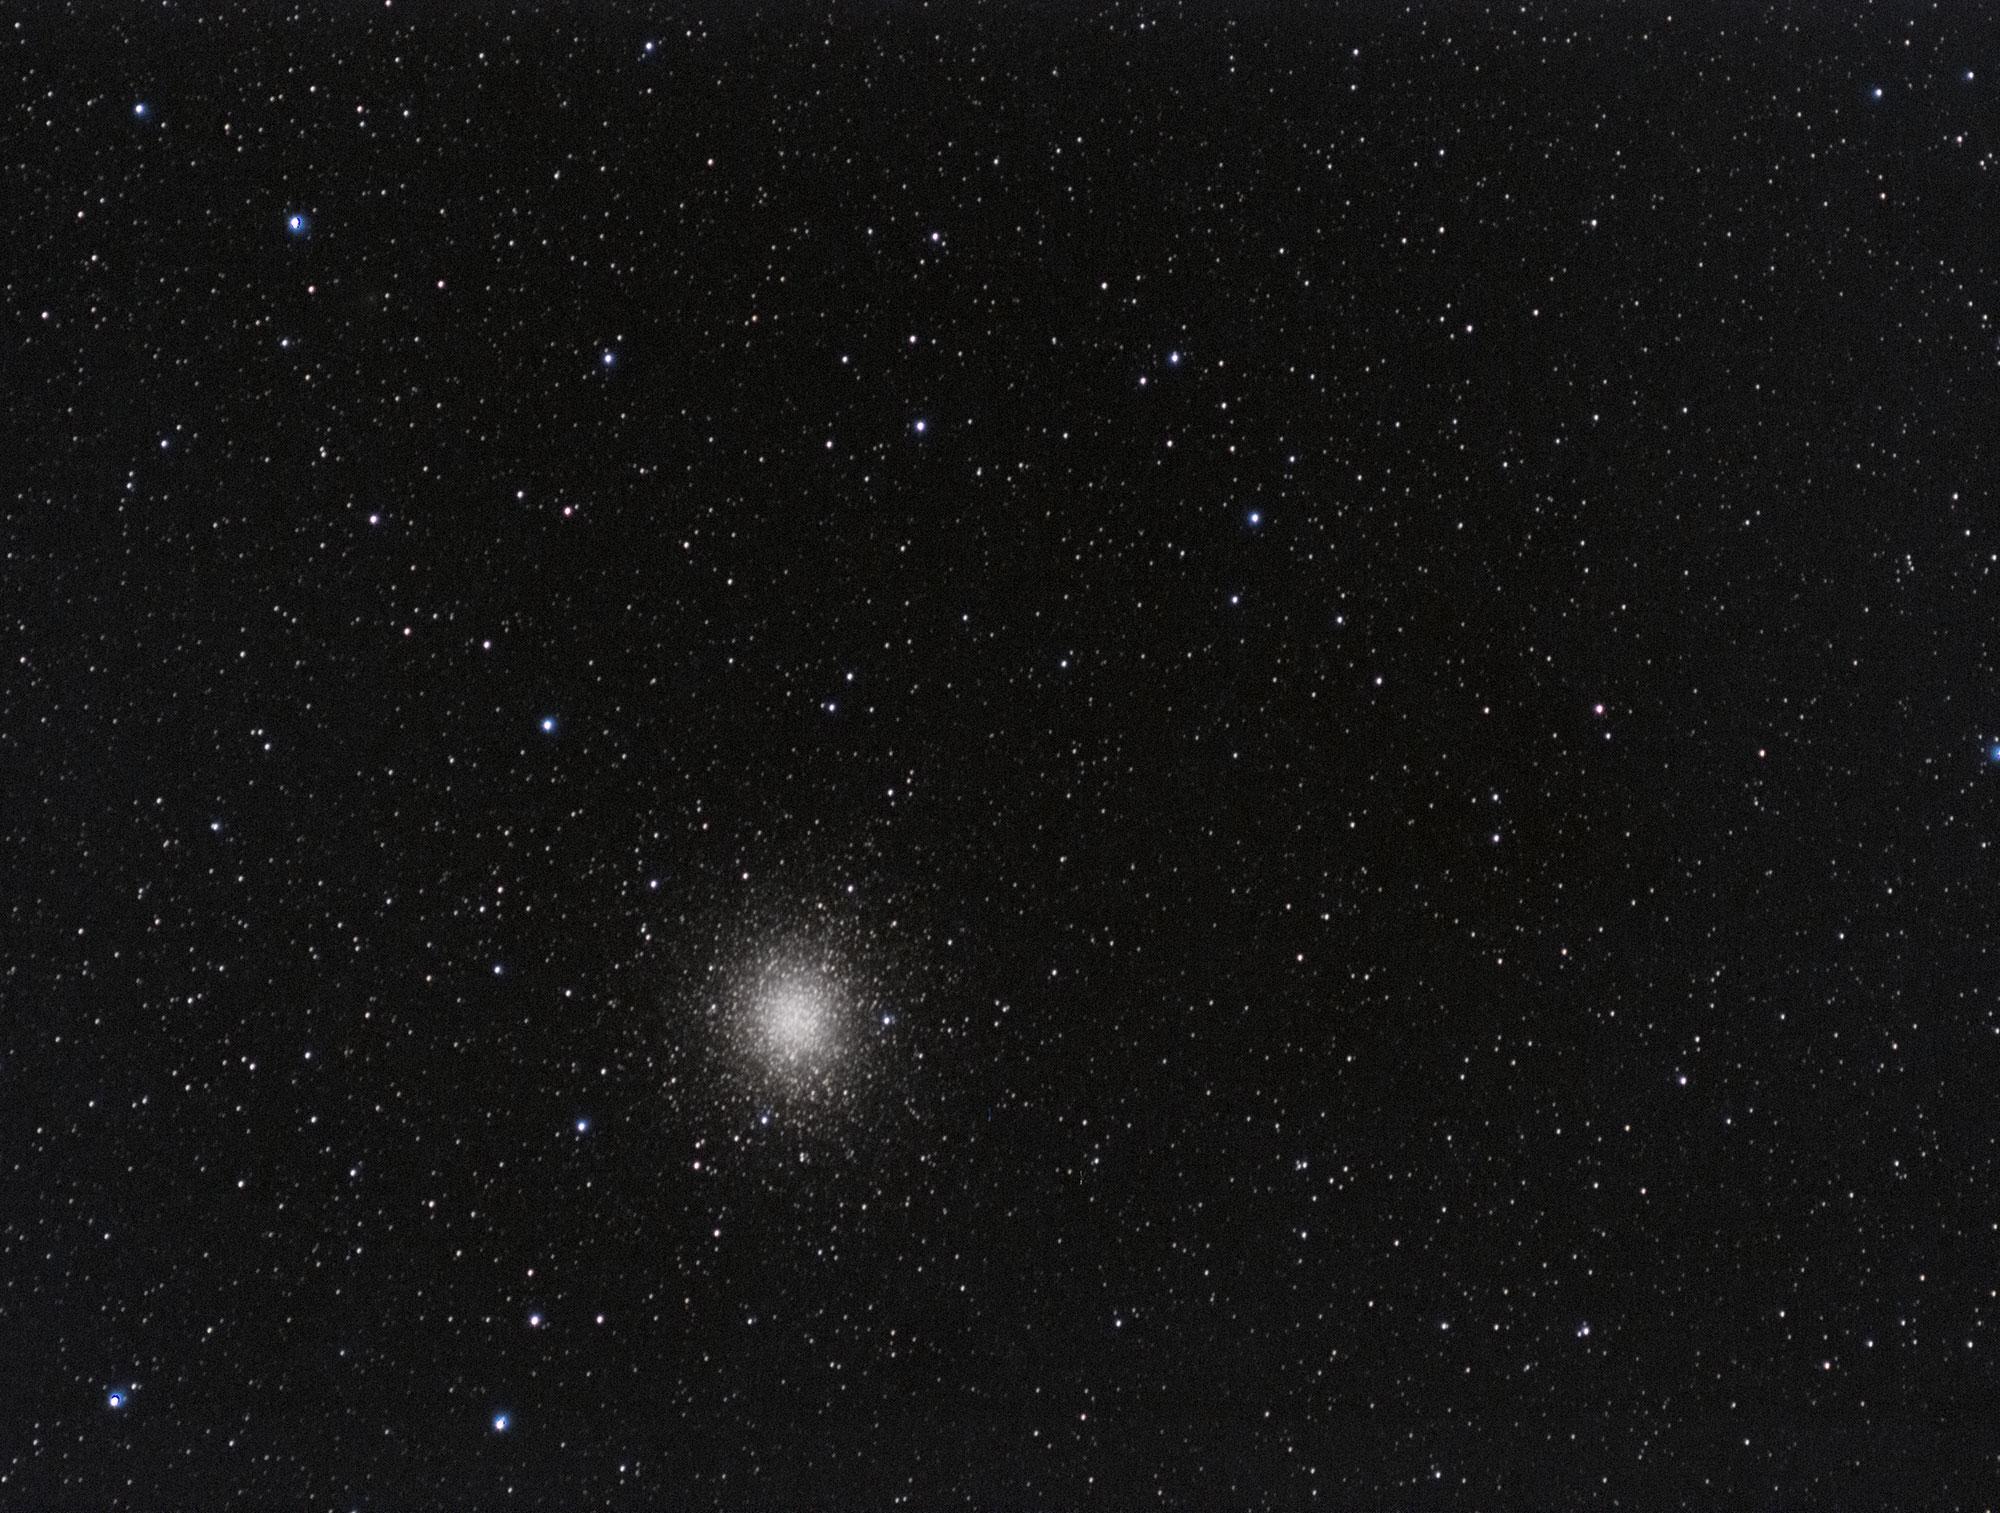 Omega Centauri astrophotography with Olympus OMD EM5 & OM 300mm - octanslab